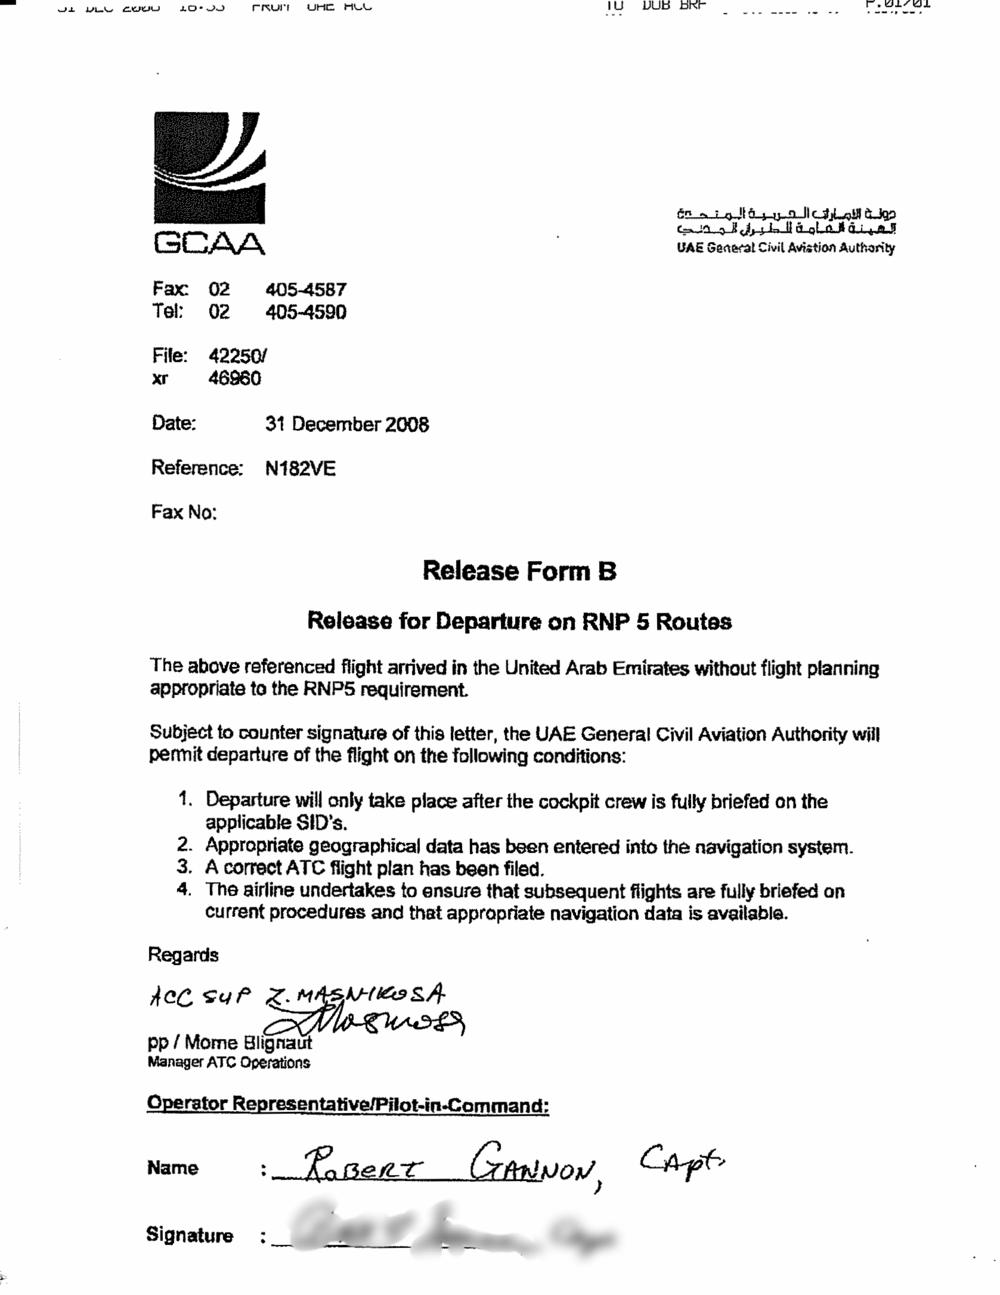 DUBAI GCAA Charges_Page_2_Image_0001.png